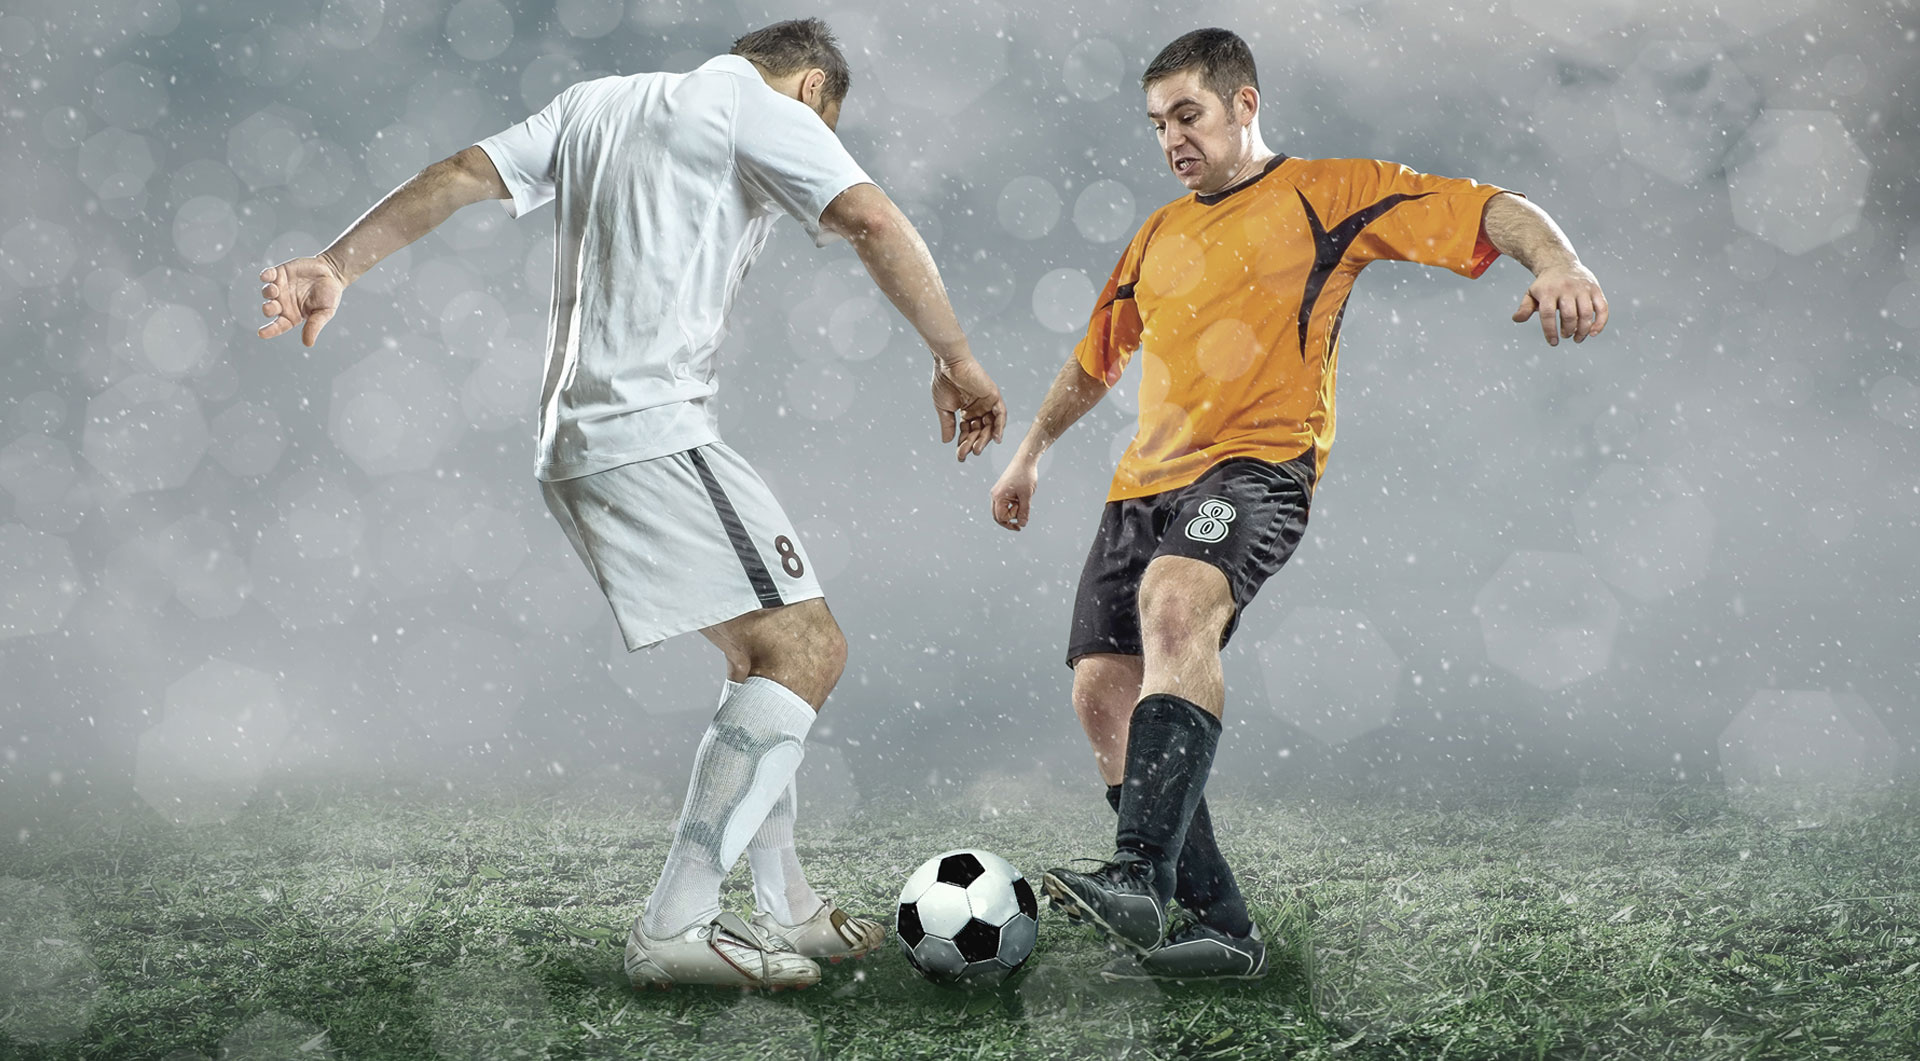 watch-serena-williams-vs-taylor-townsend-round-1-us-open-2014-online